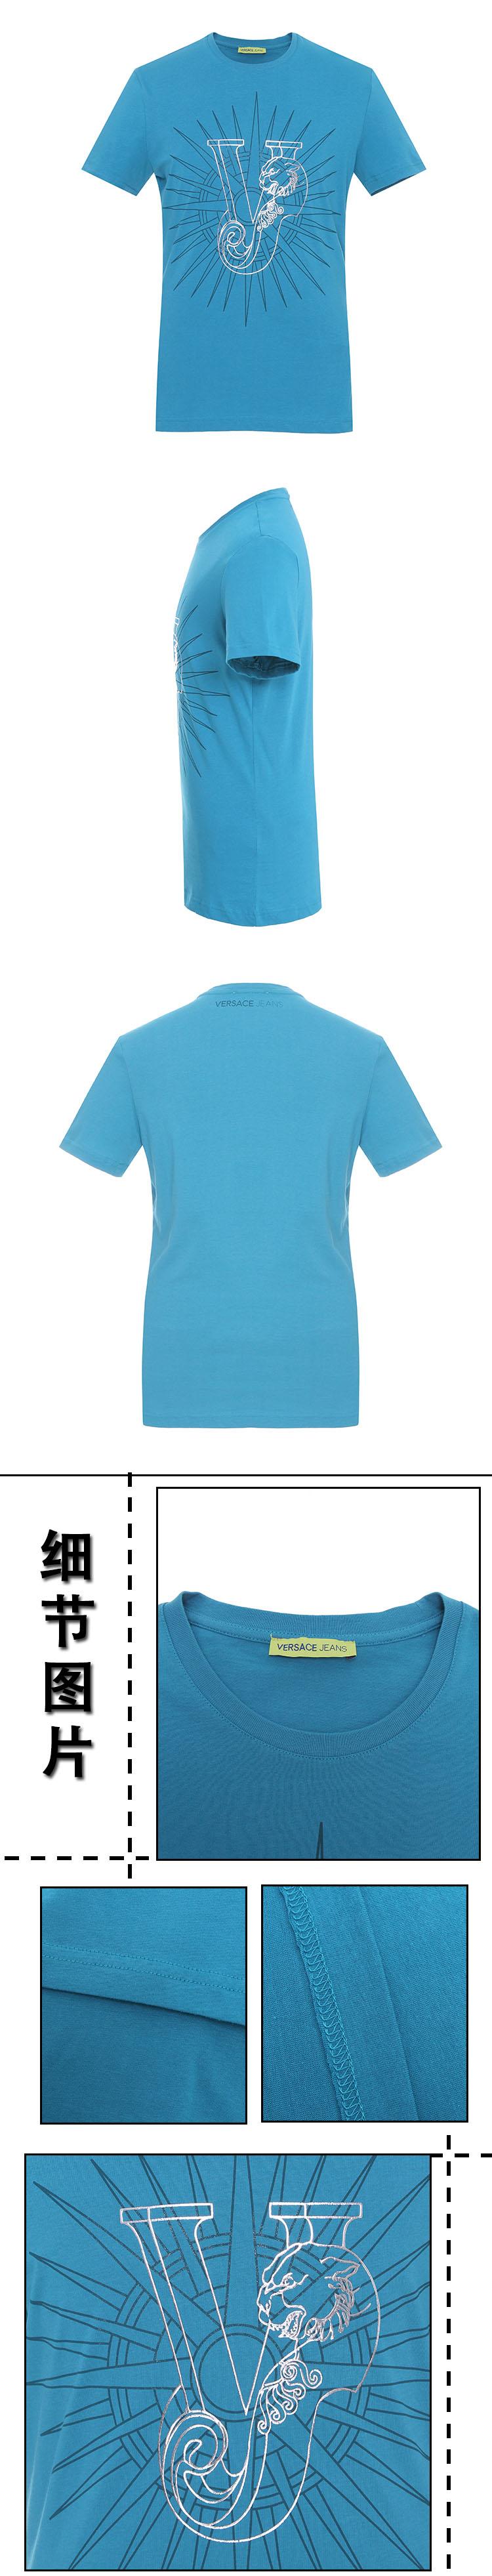 versace jeans/范思哲牛仔 圆领纯棉logo印花短袖t恤 b3glb728 36591